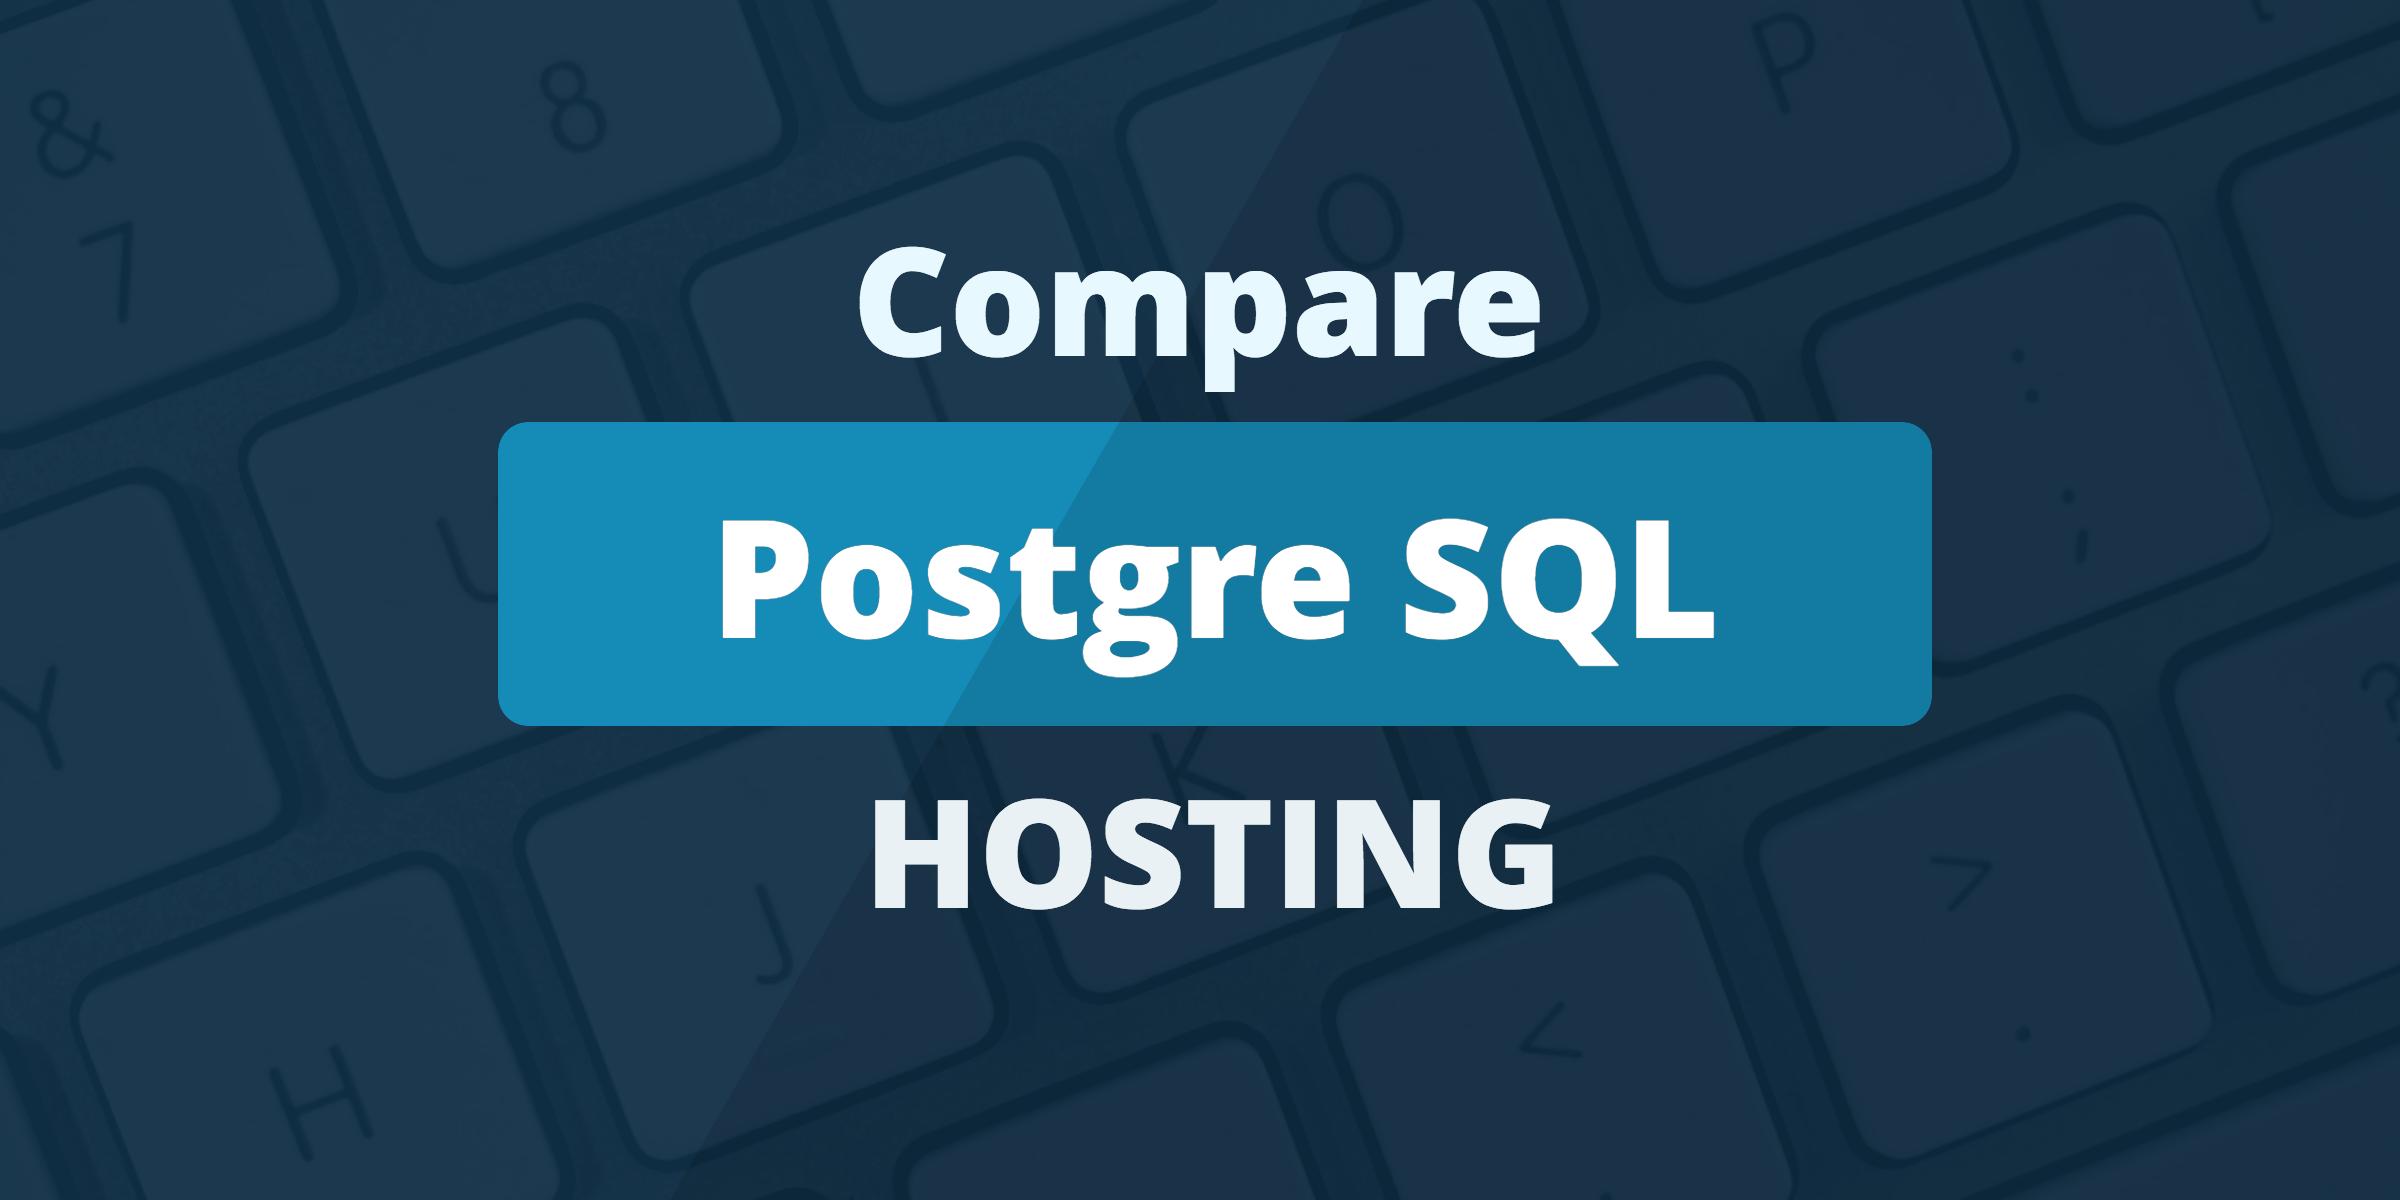 compare postgresql hosting